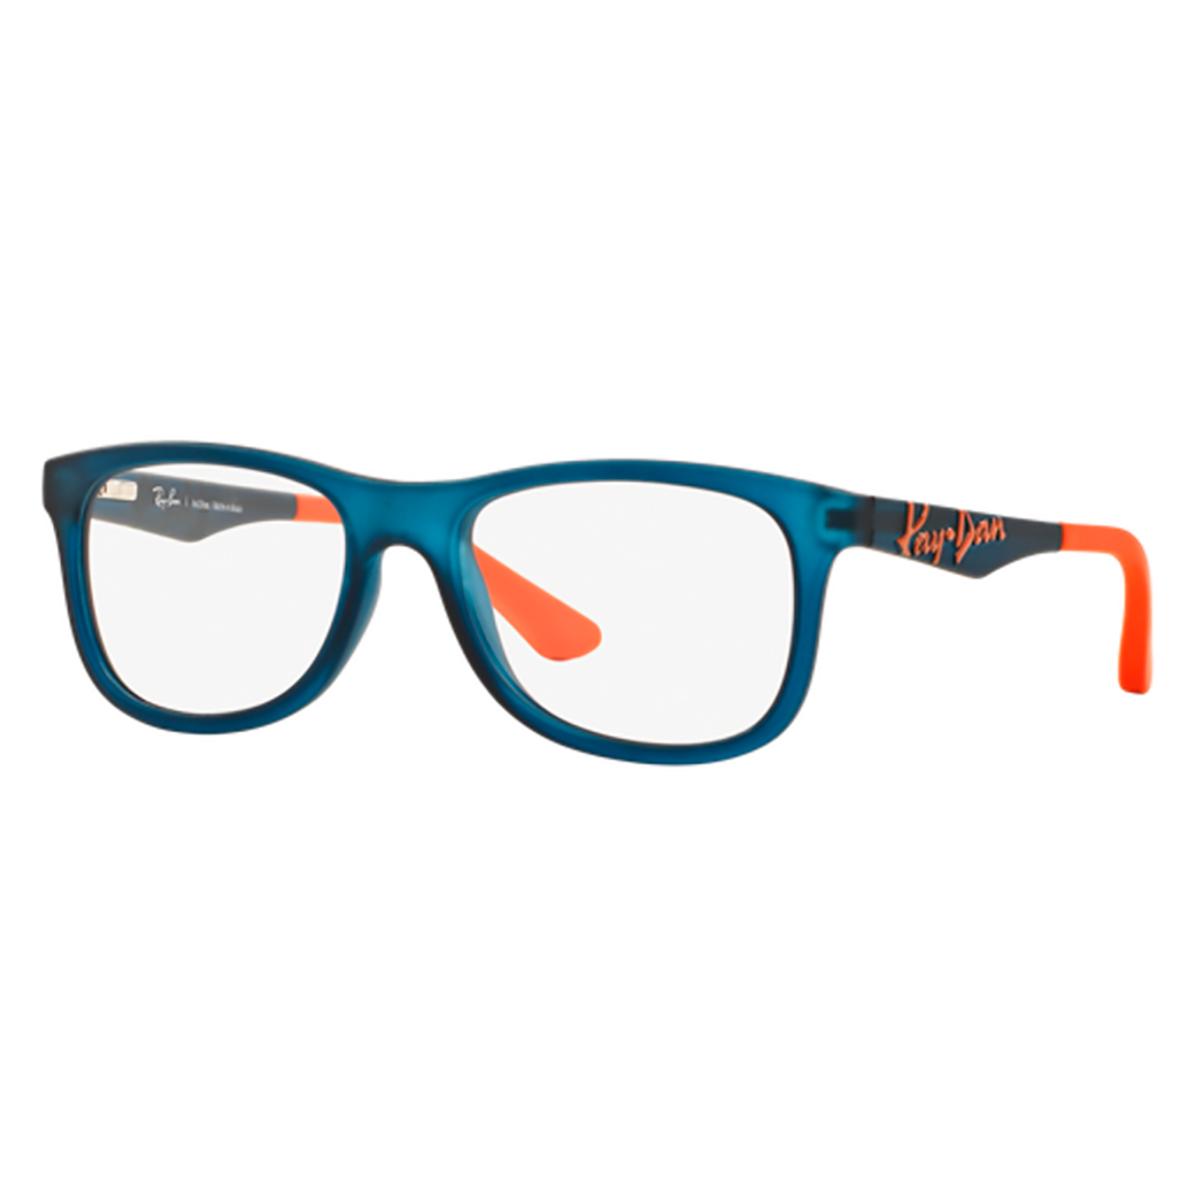 Óculos de Grau Ray Ban Infantil RB1551l   Tri-Jóia Shop 91f5b43f22